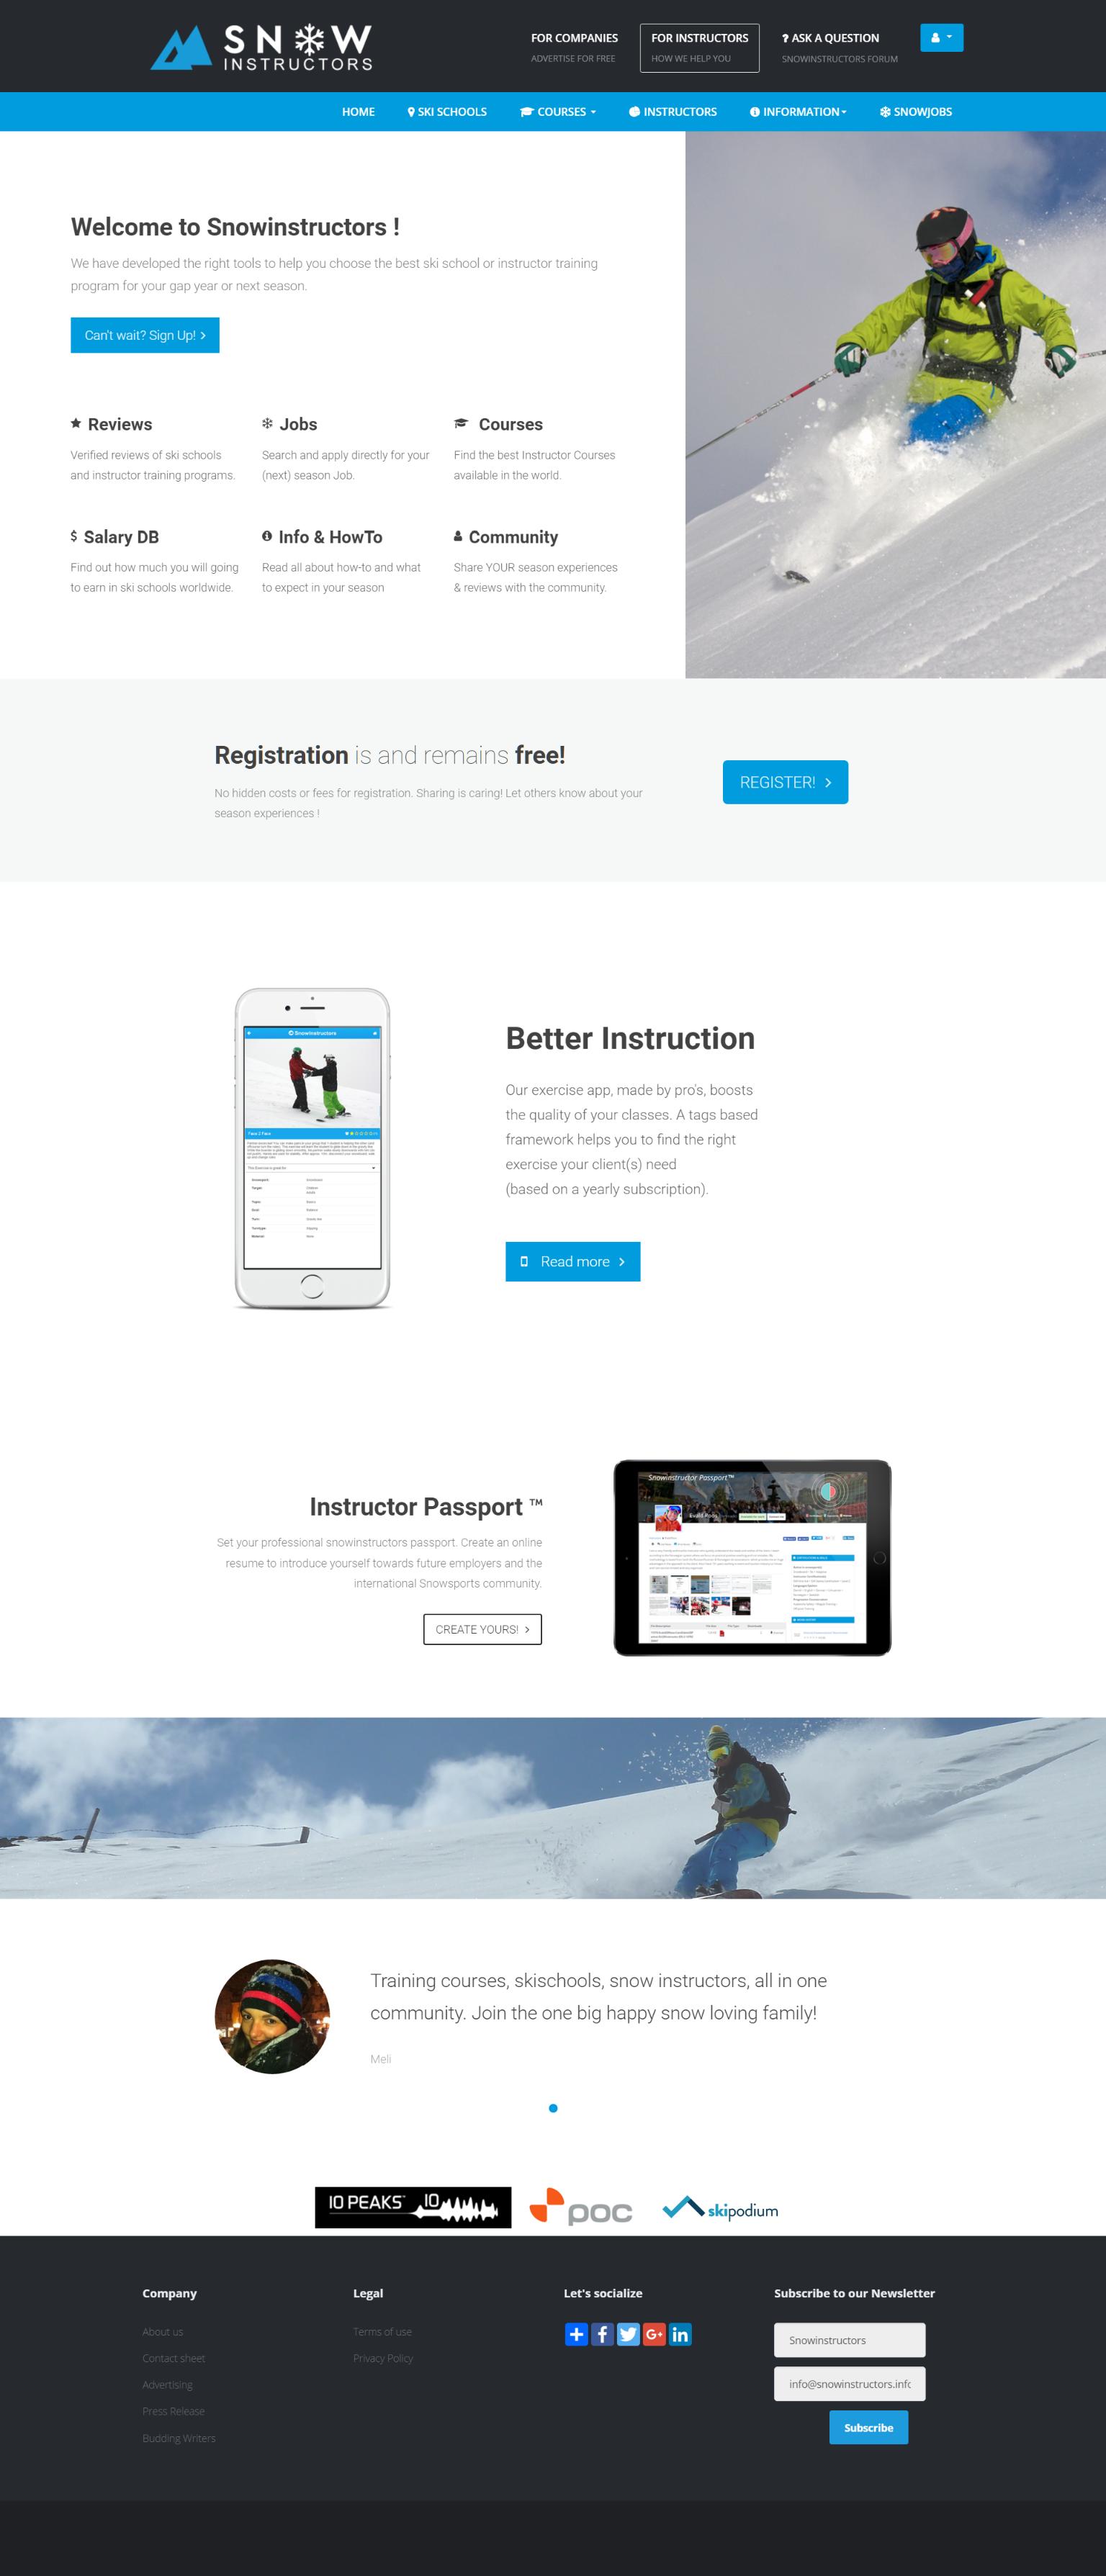 screenshot-www.snowinstructors.info-2017-03-06-12-55-23